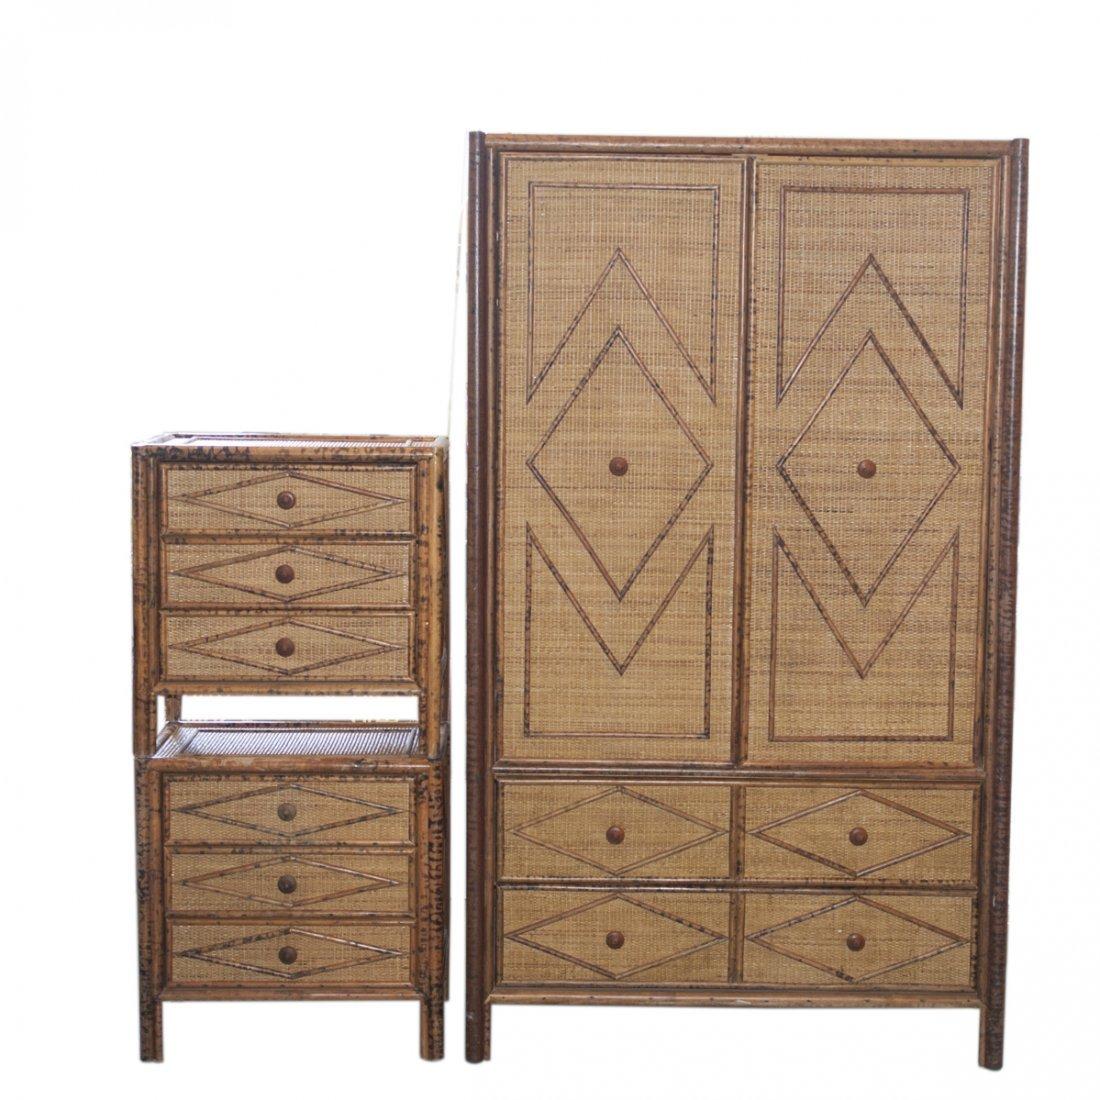 Vintage Wicker & Bamboo Furniture Set - 2